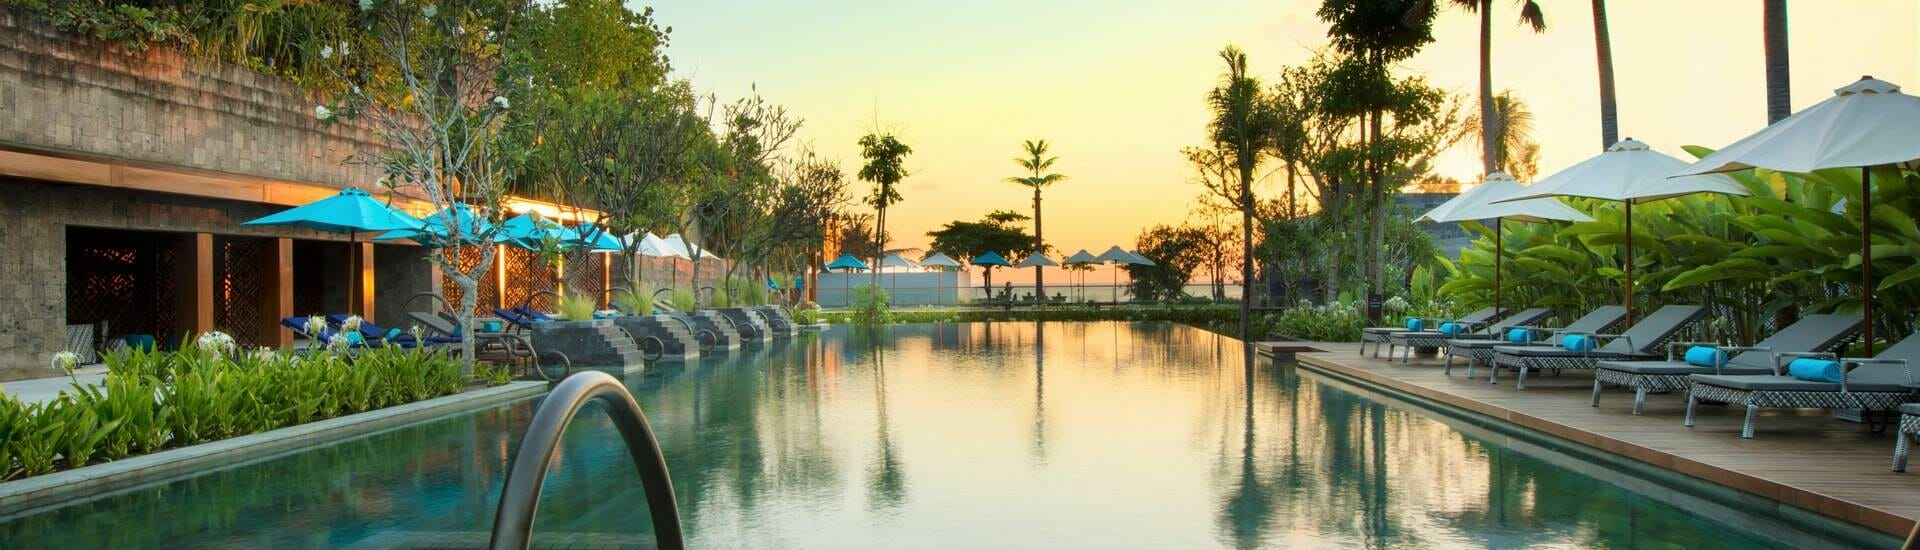 Hotel Indigo Bali Seminyak Hero Image - Main Pool